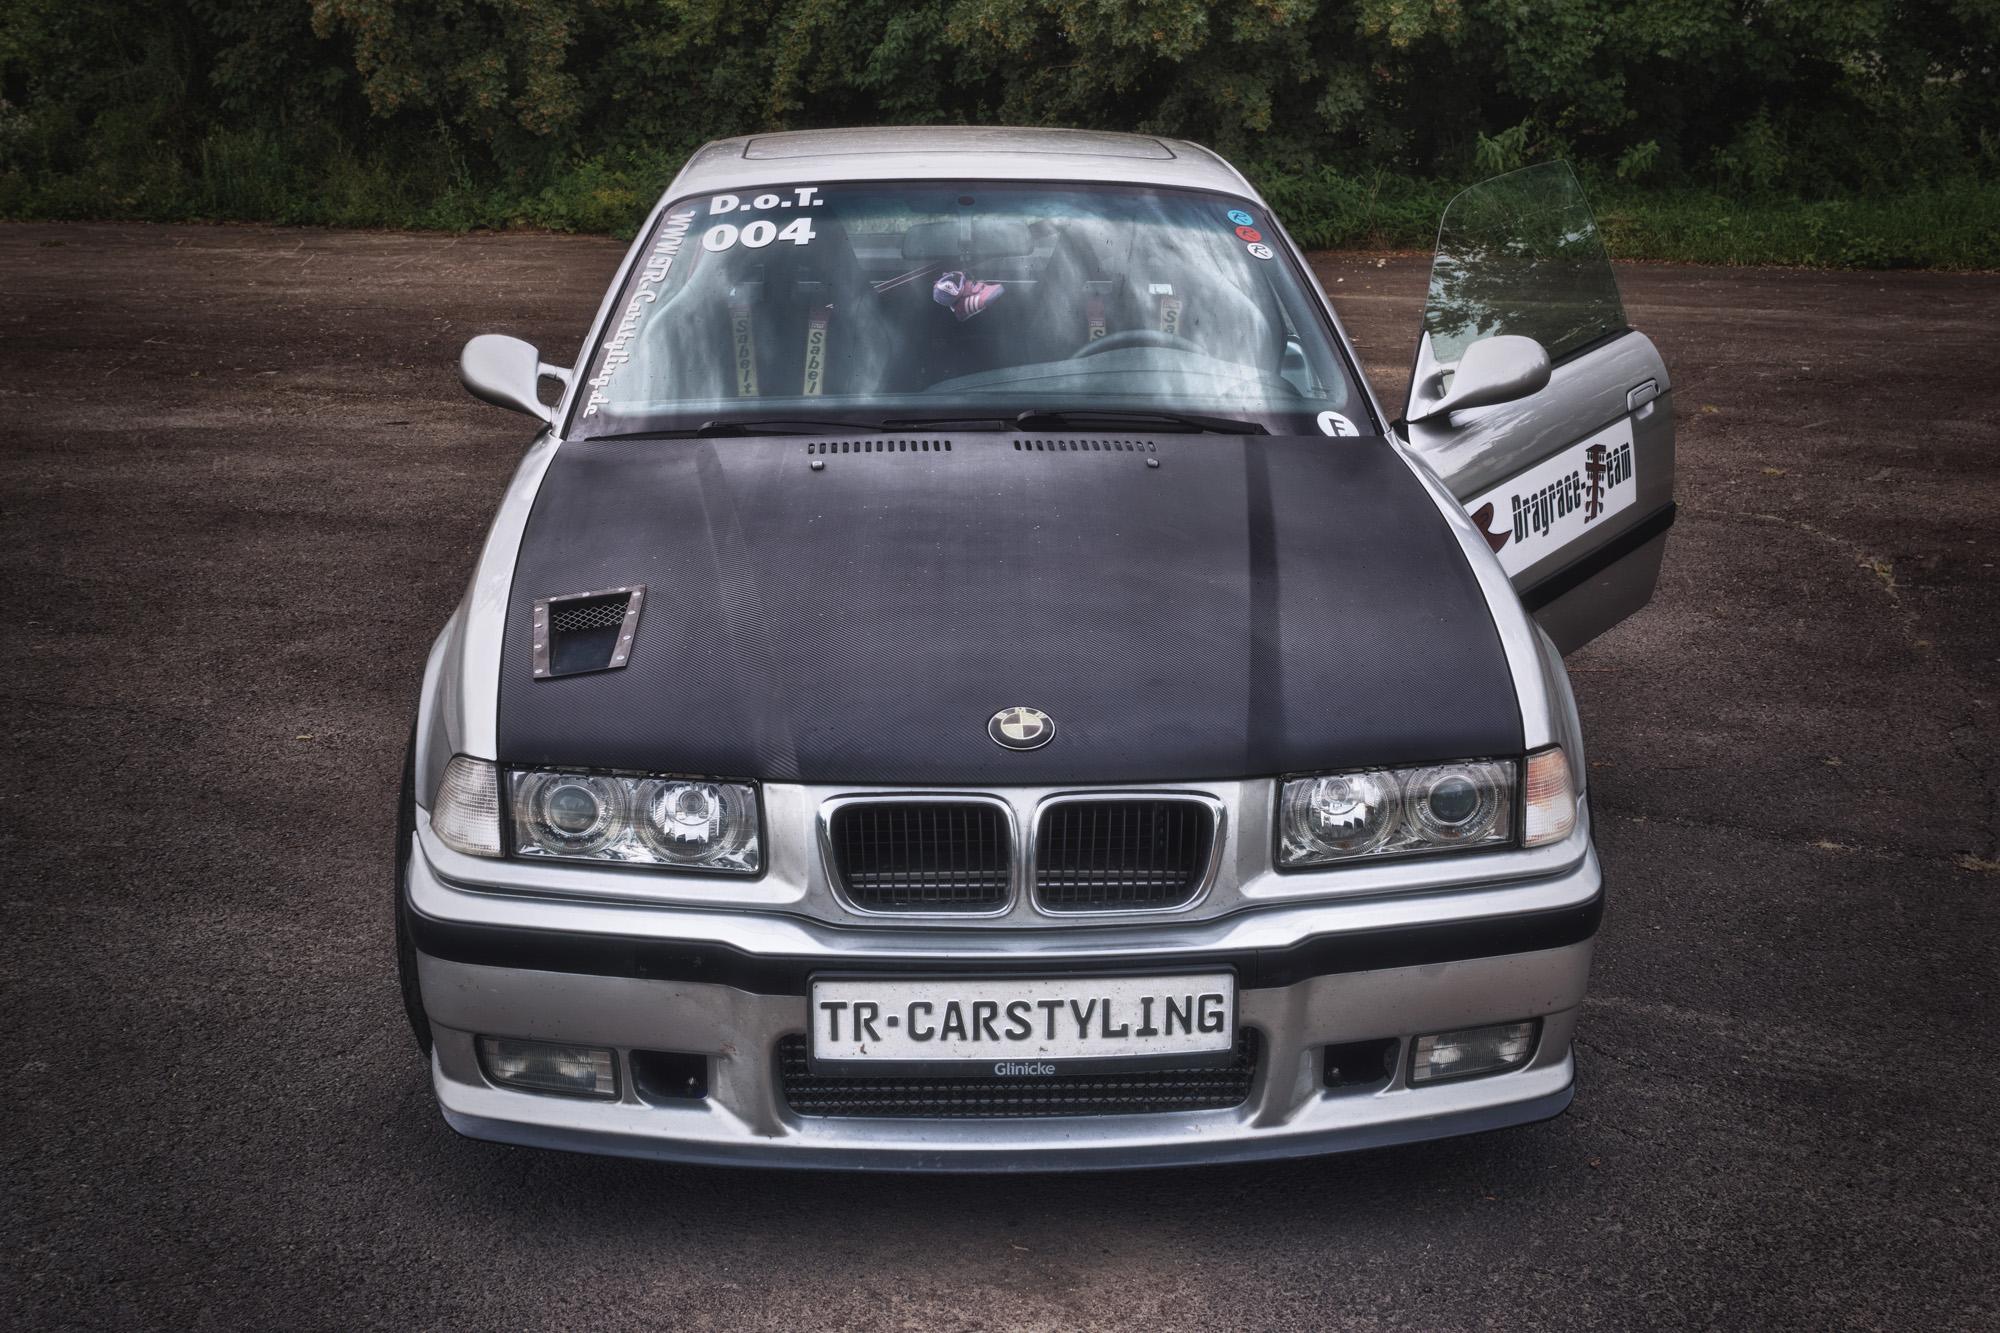 bmw-m3-e36-turbo-tr-carstyling-04